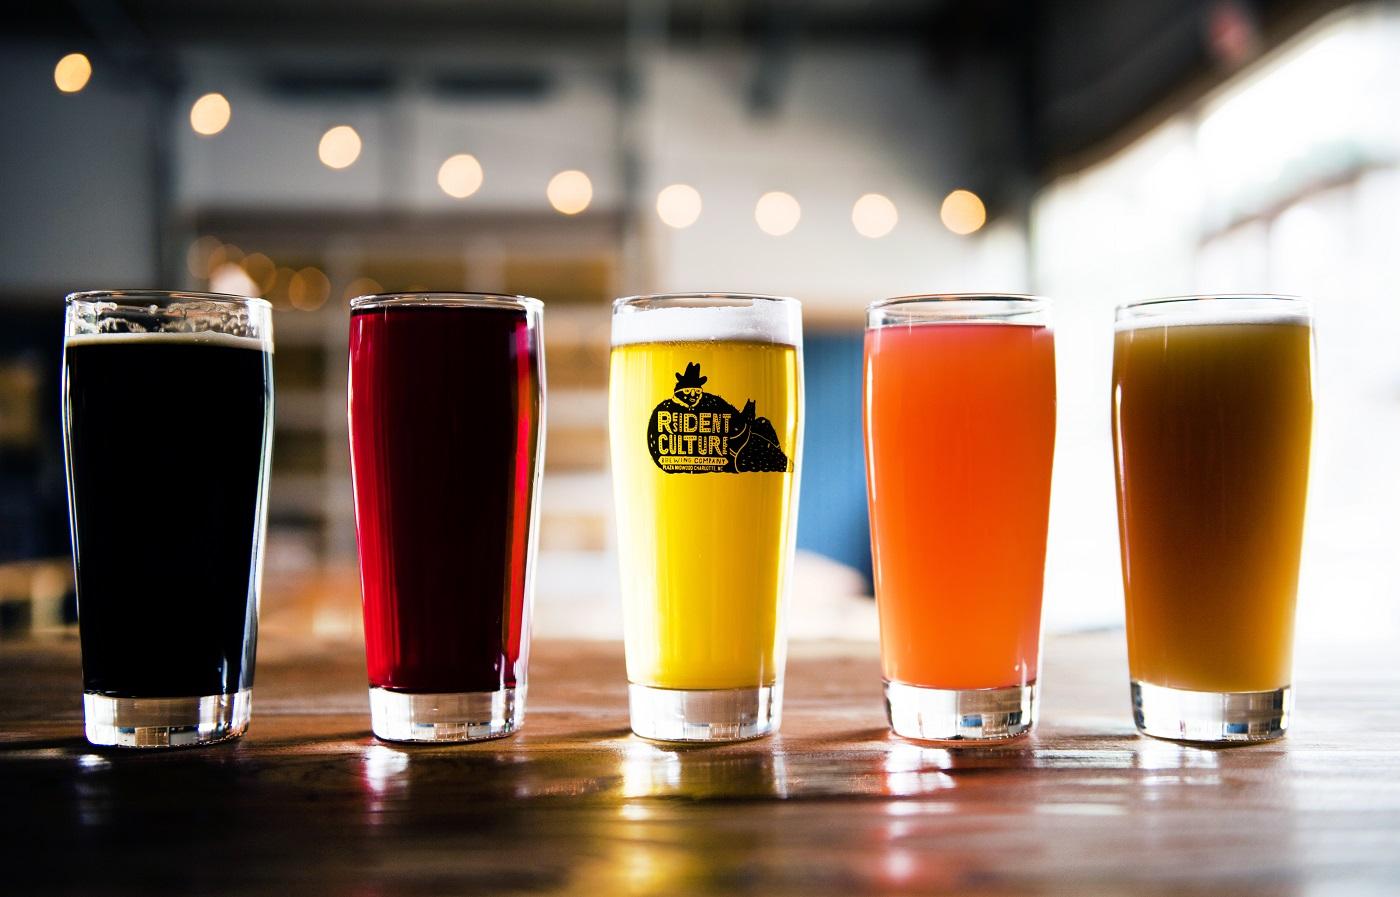 Charlotte Beer Releases